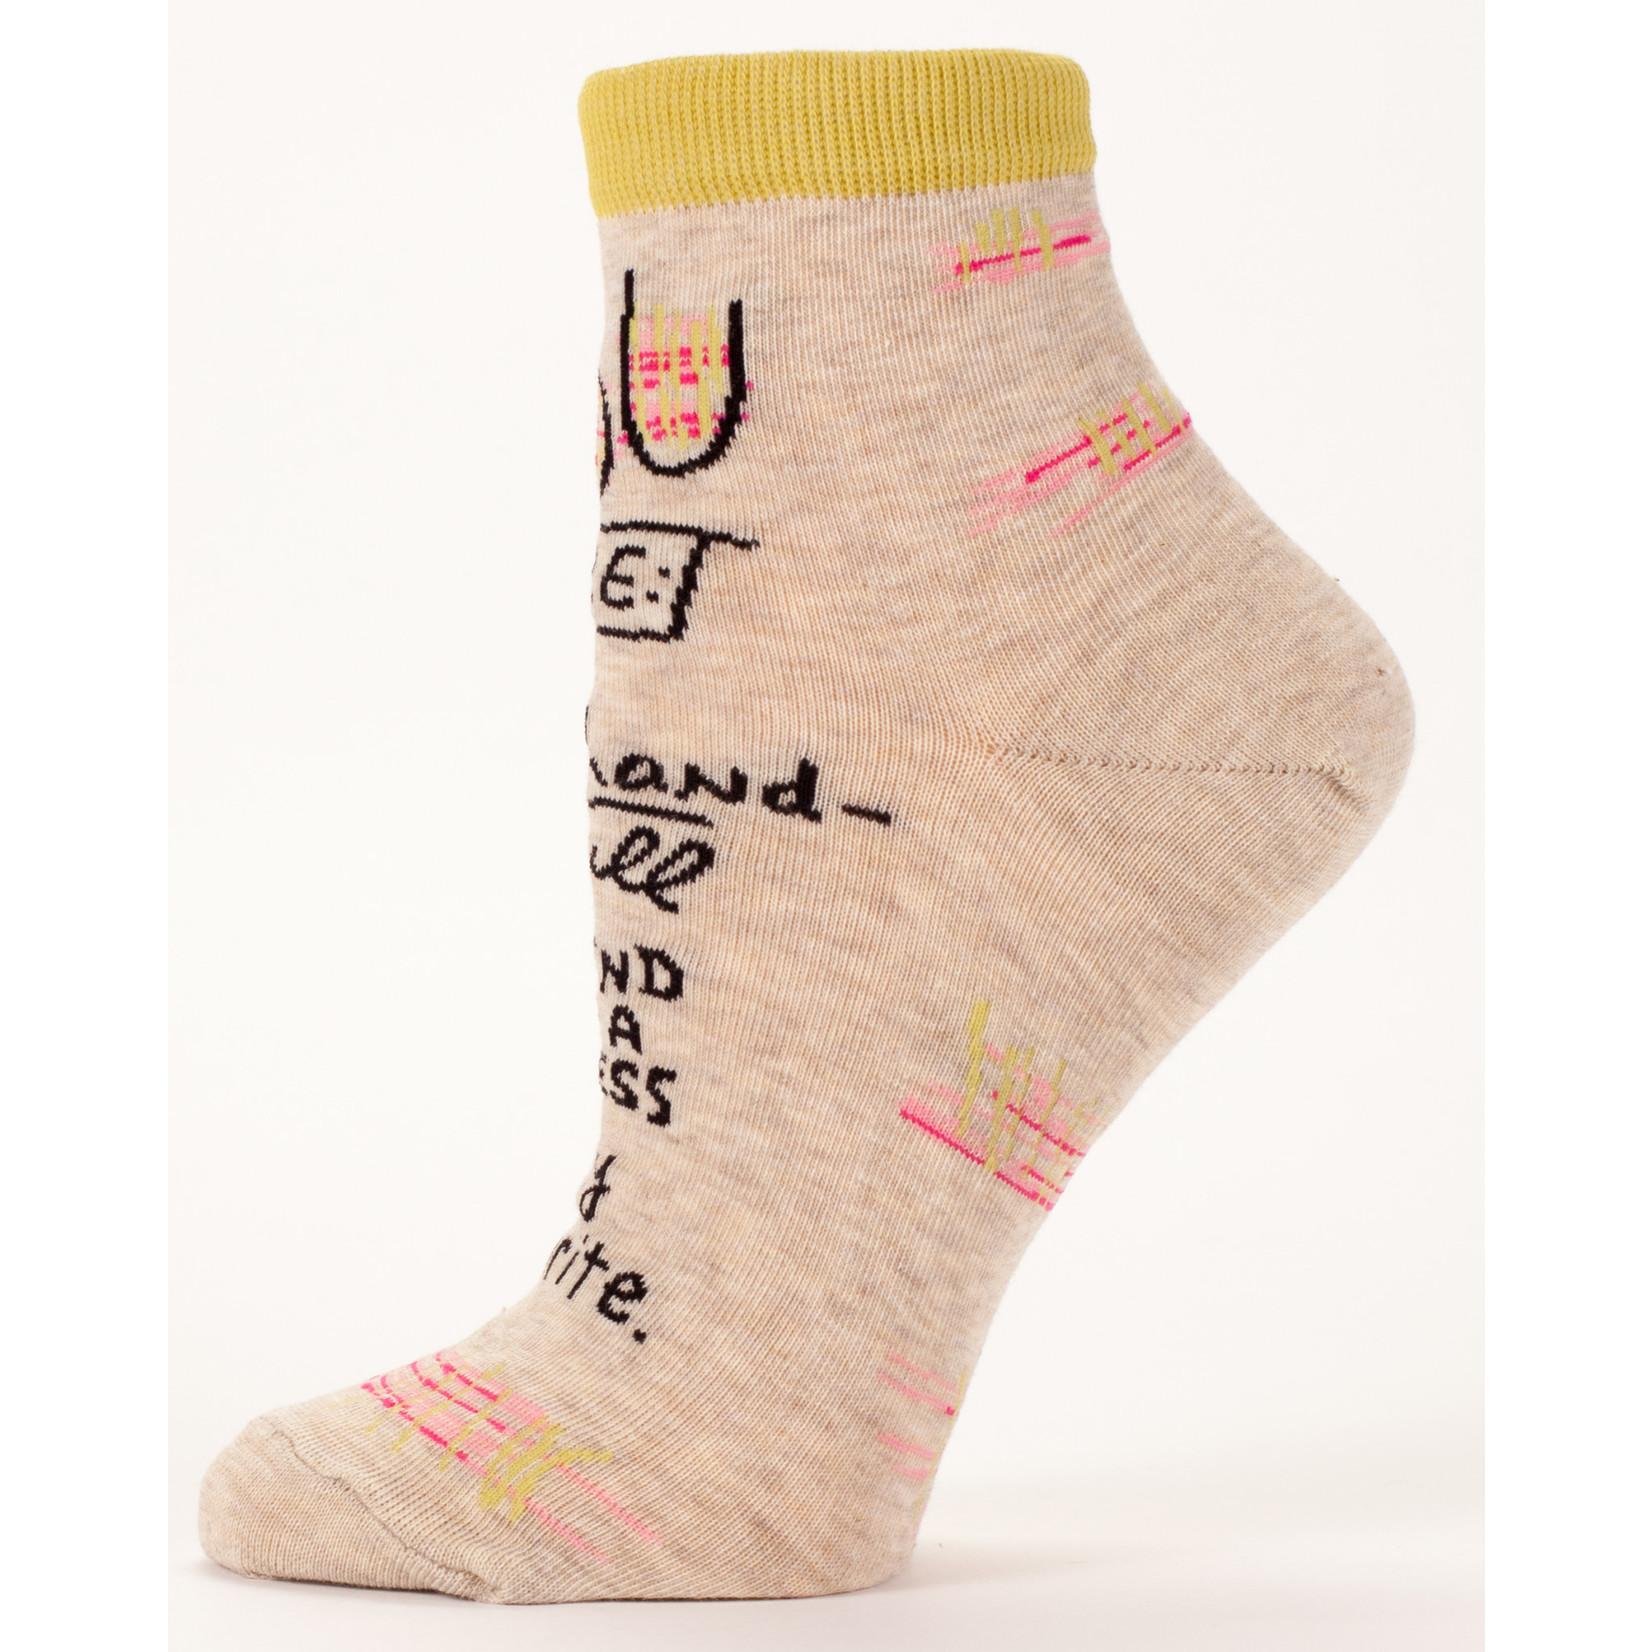 Blue Q Womens Ankle Socks - My Favorite